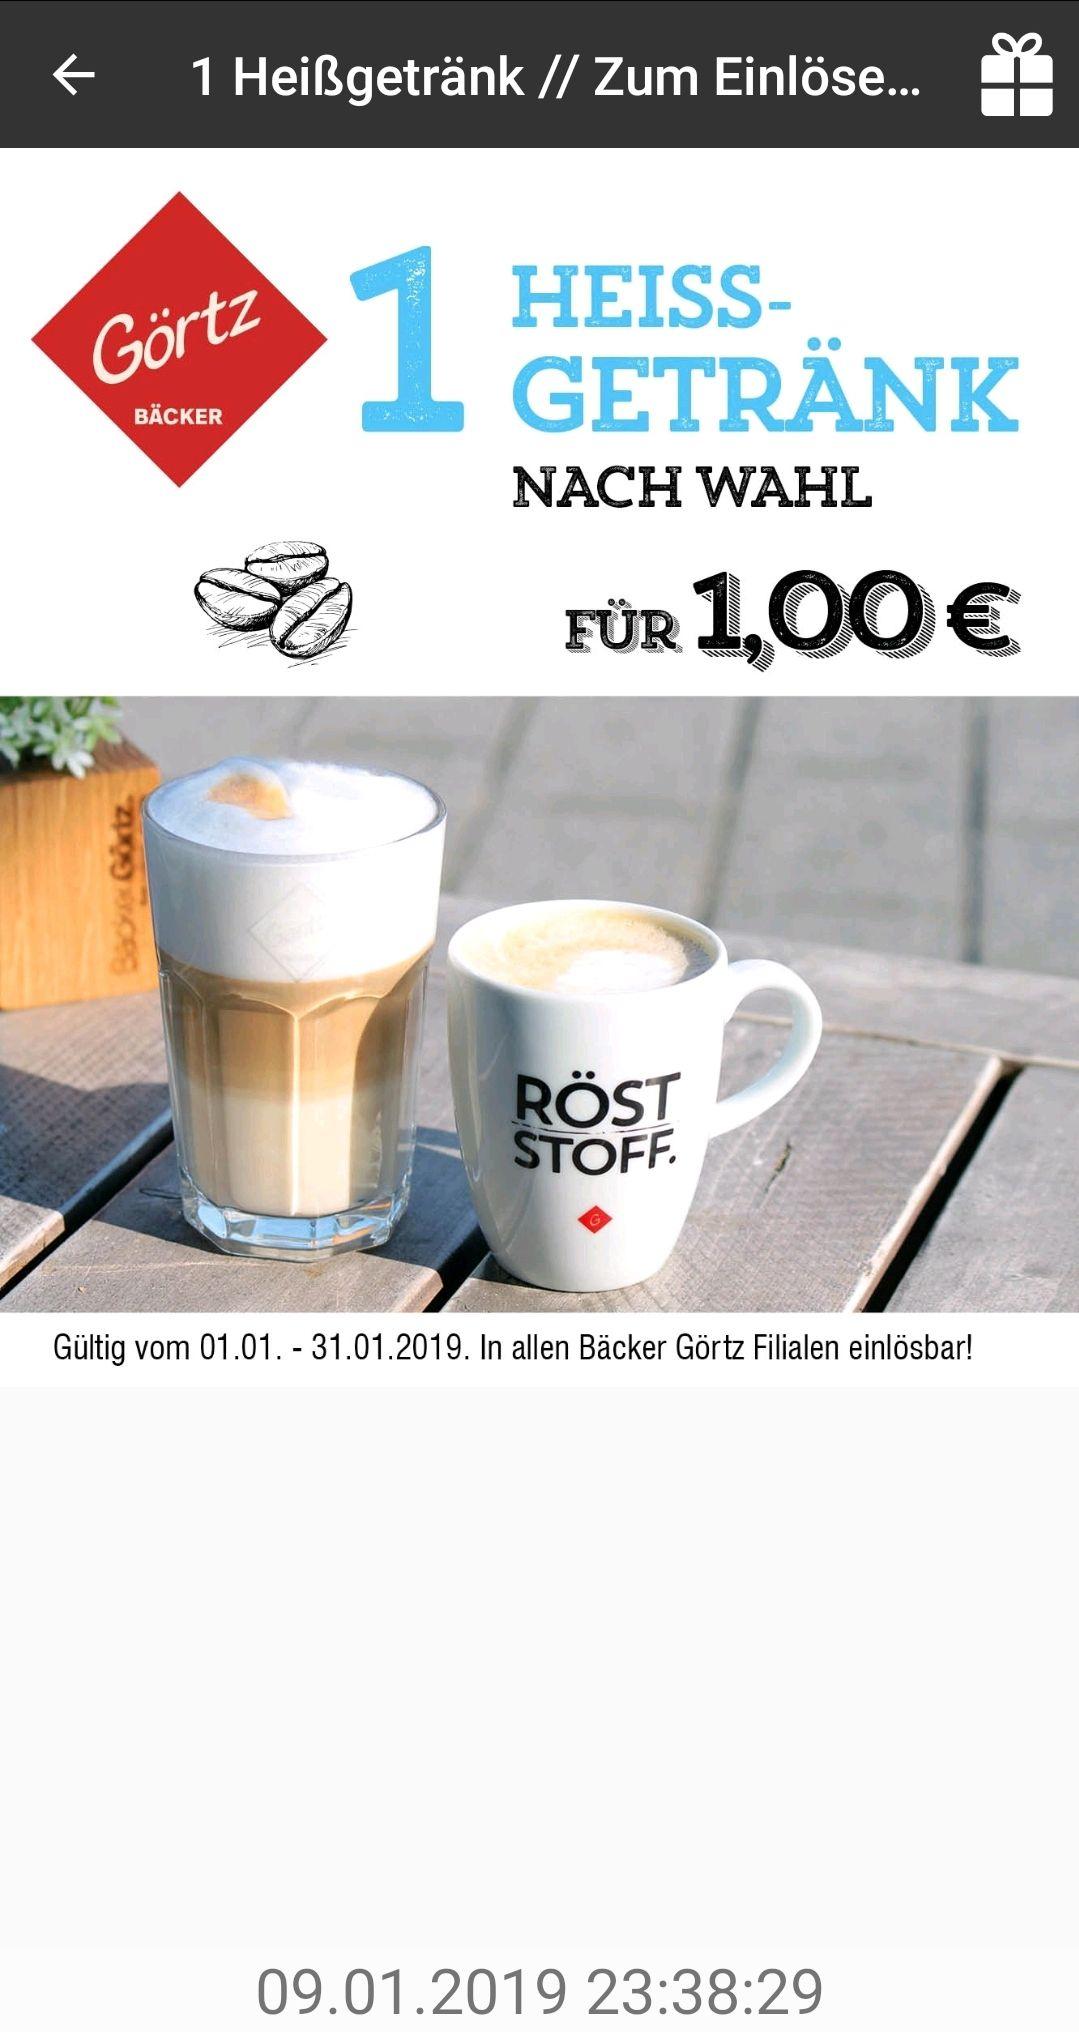 Bäckerei Görtz 1 x Heißgetränk nach Wahl 1,50€ (Kaffee o. Heiße Schokolade) bis 31.01.2019